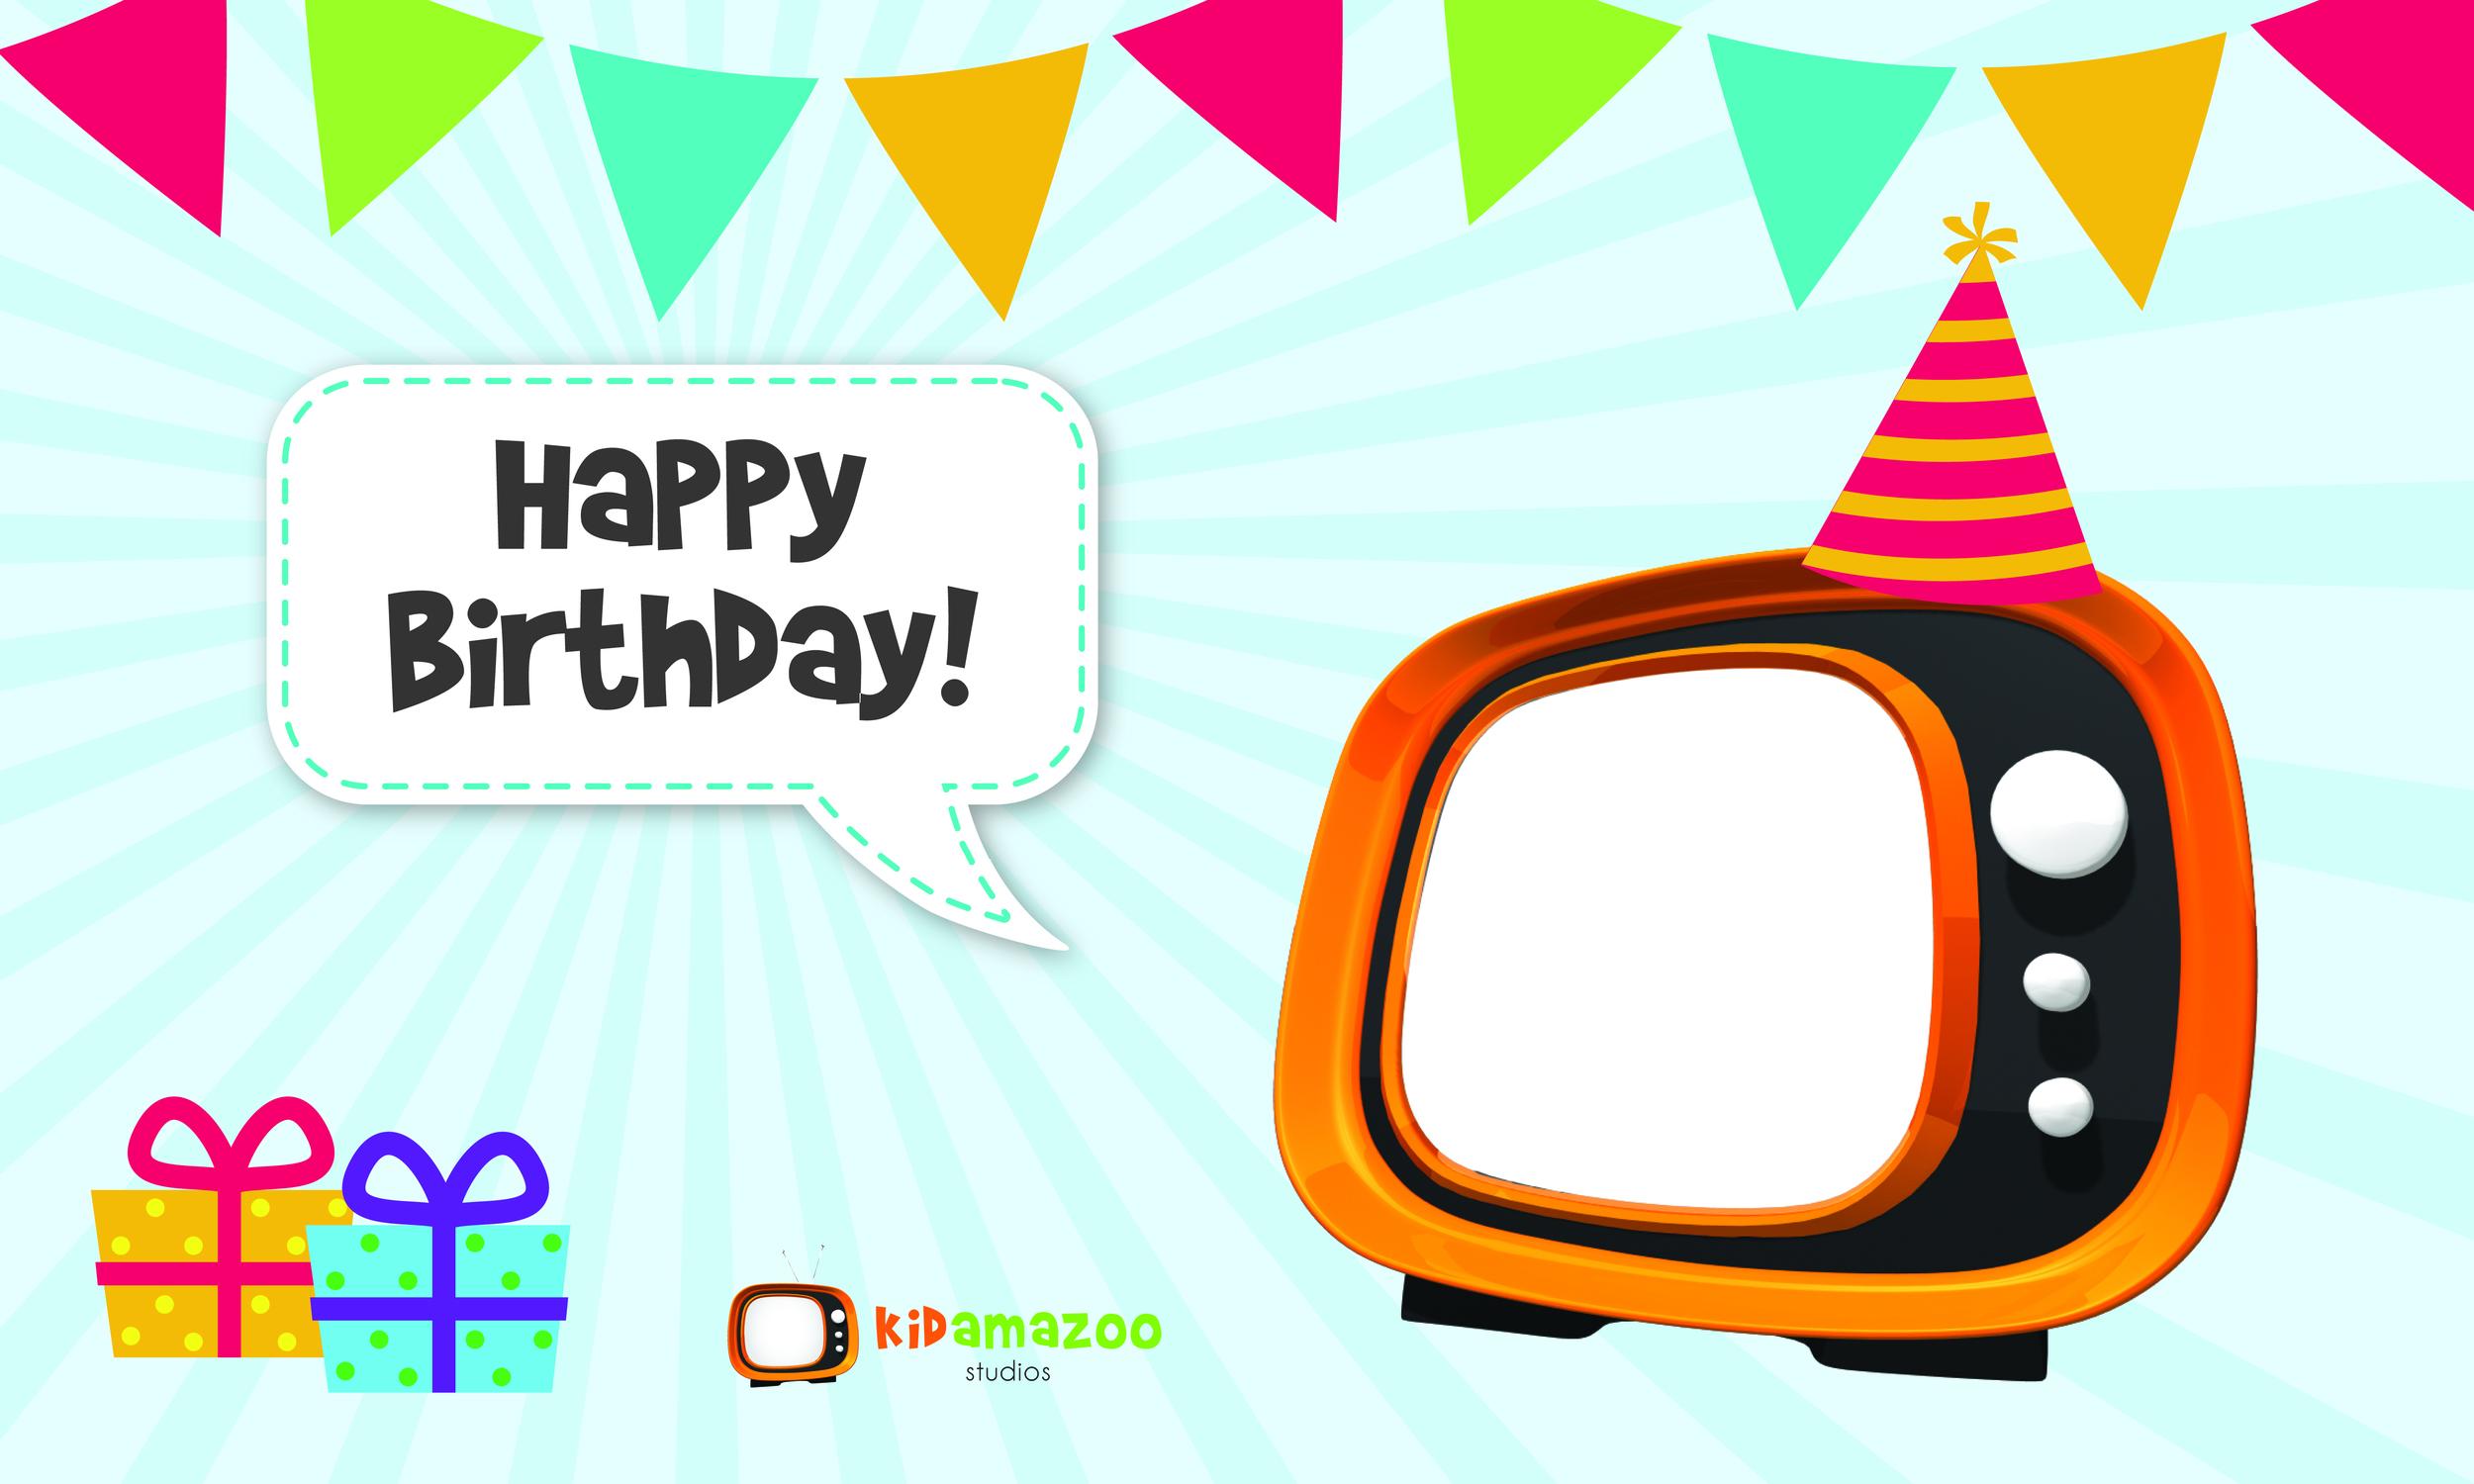 KidamazooStudios_BirthdayKit_BirthdaySlide.jpg